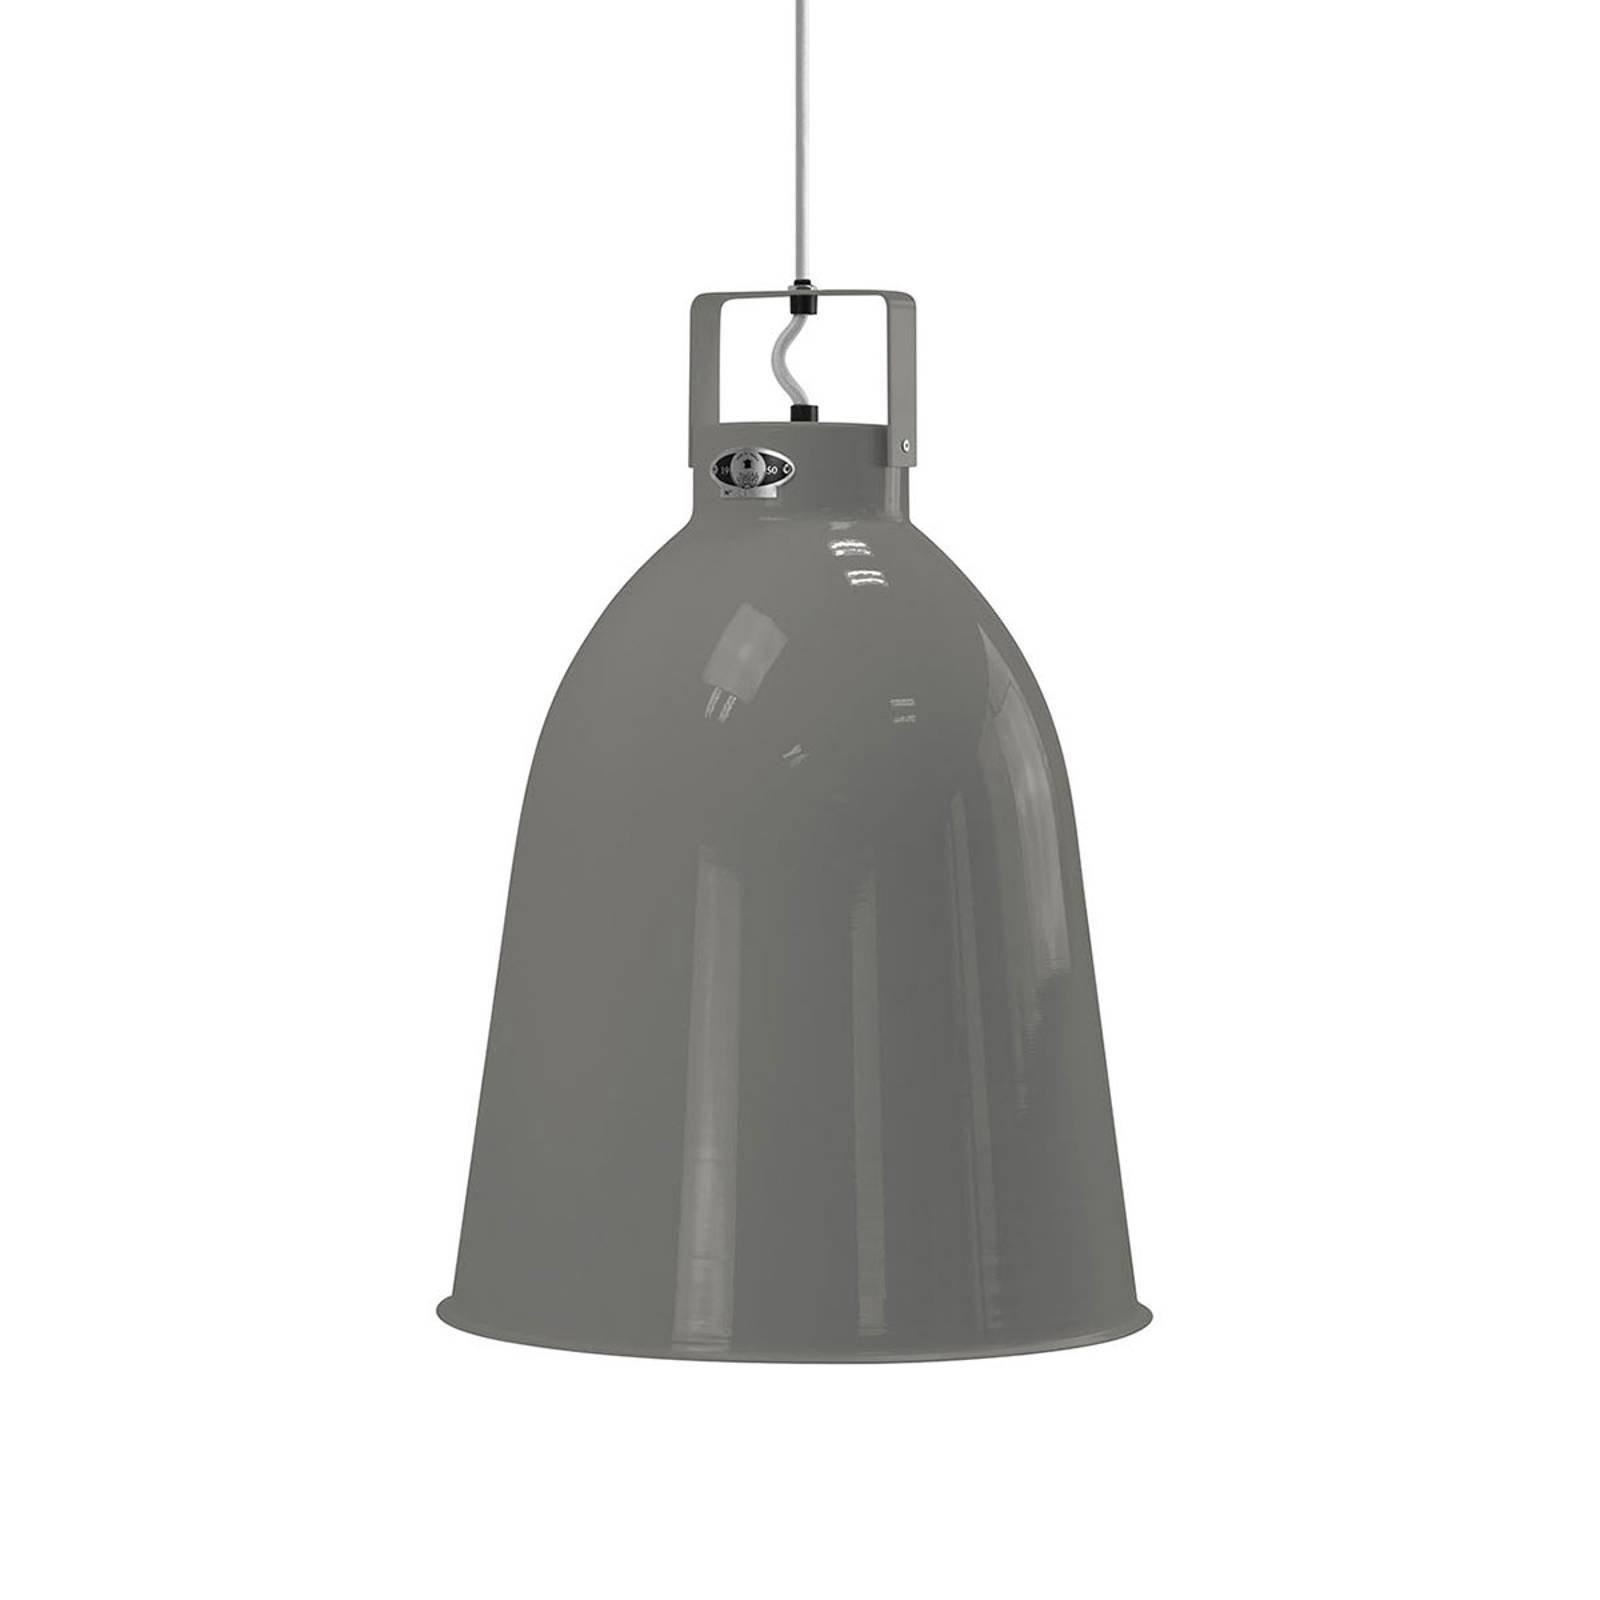 Jieldé Clément C360 hengelampe, blank grå, Ø 36 cm